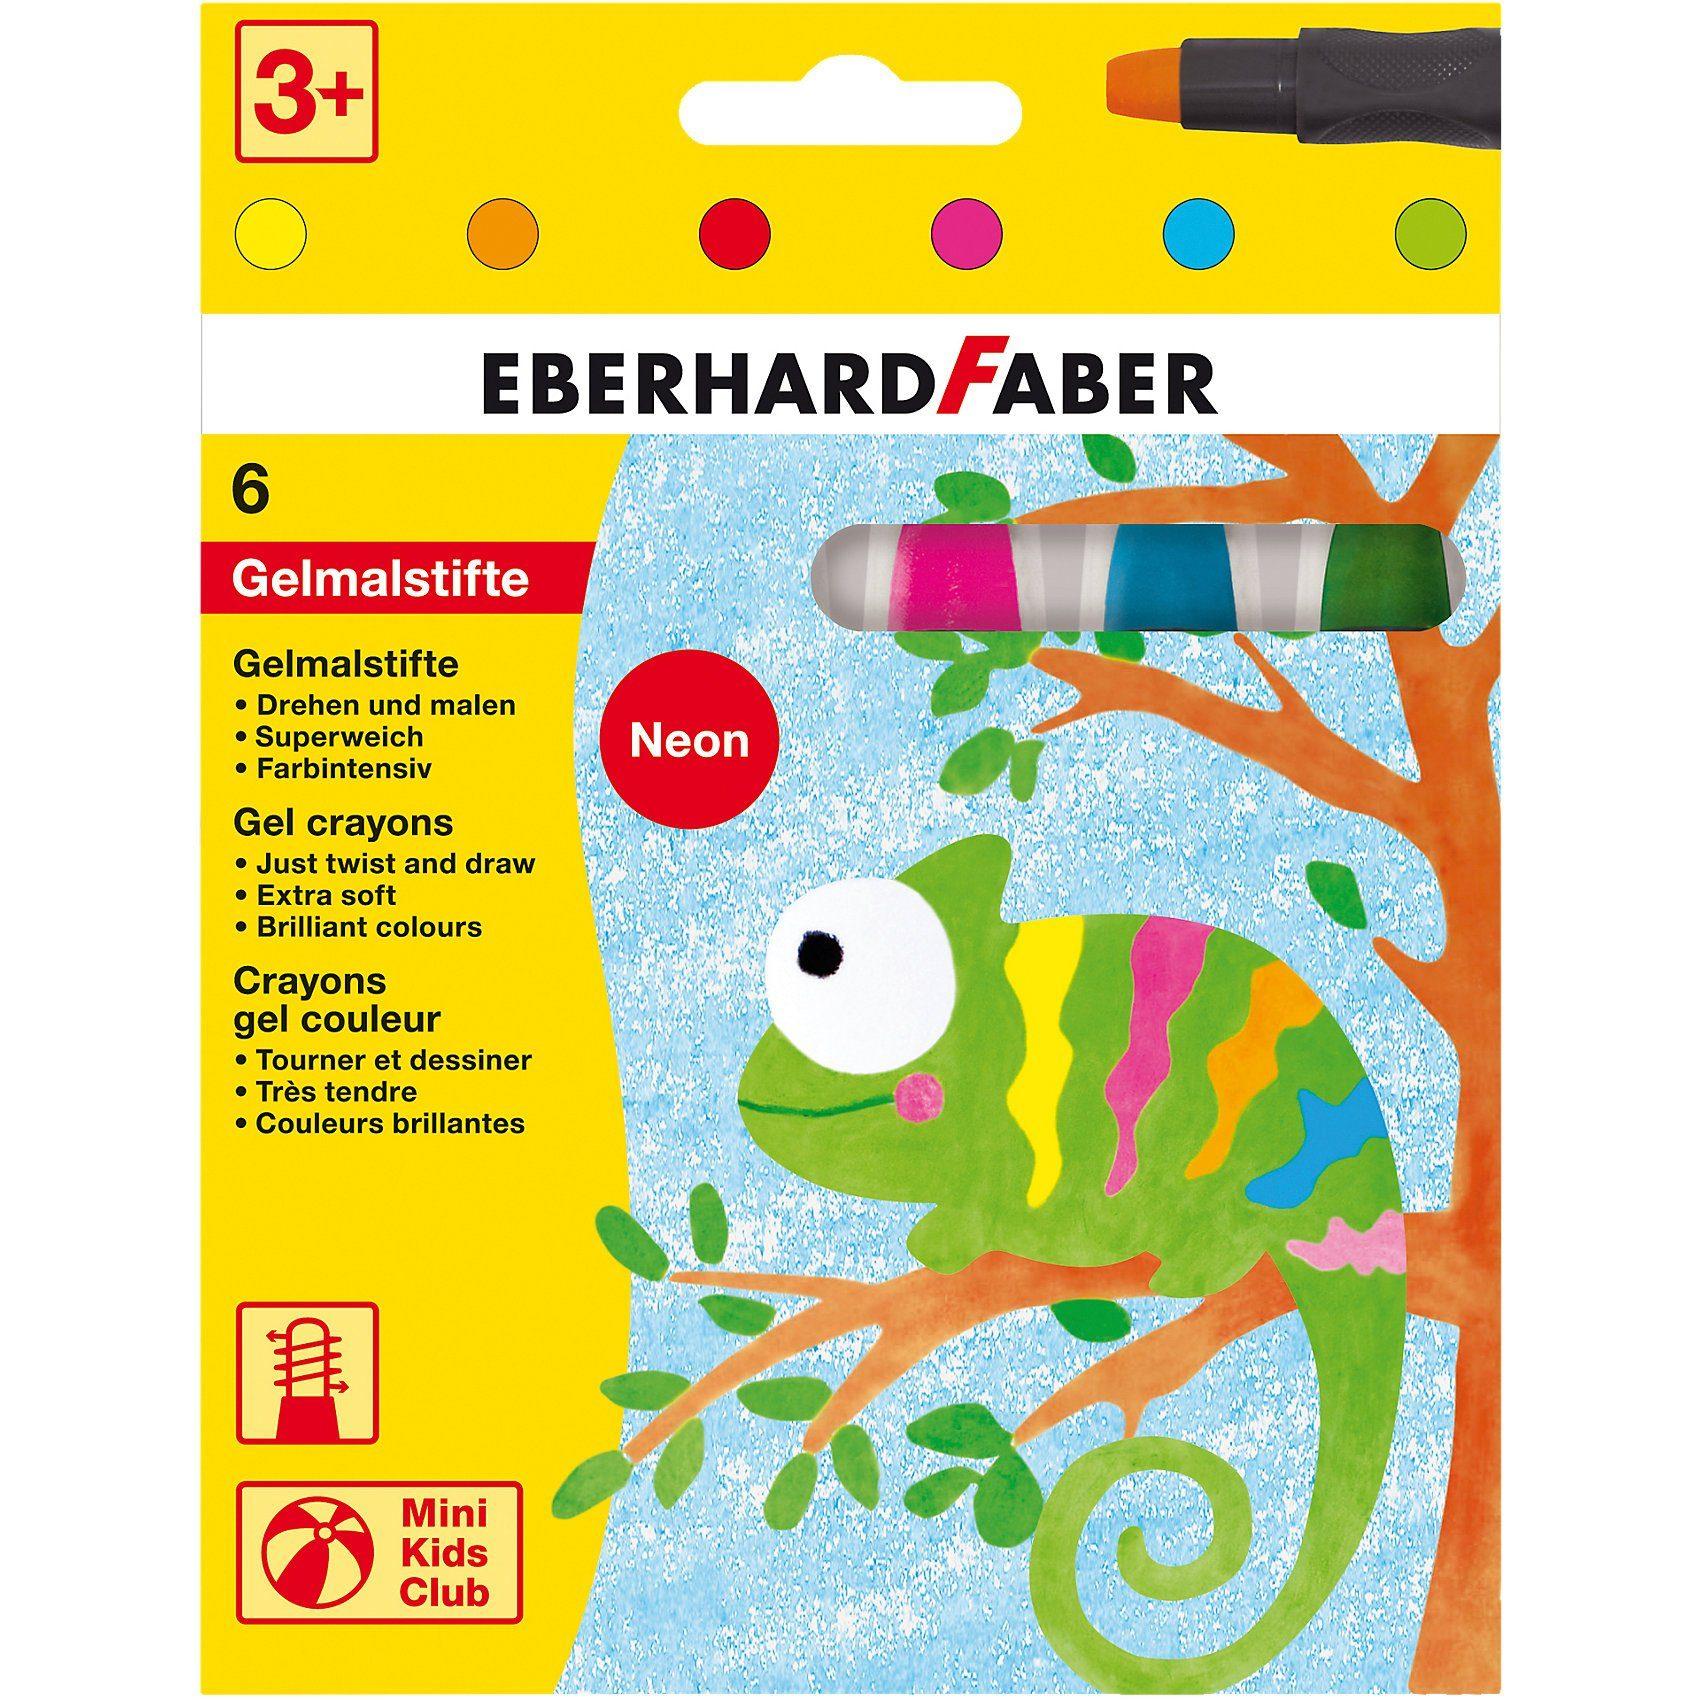 Eberhard Faber Mini Kids Gelmalstifte, 6 Neon-Farben